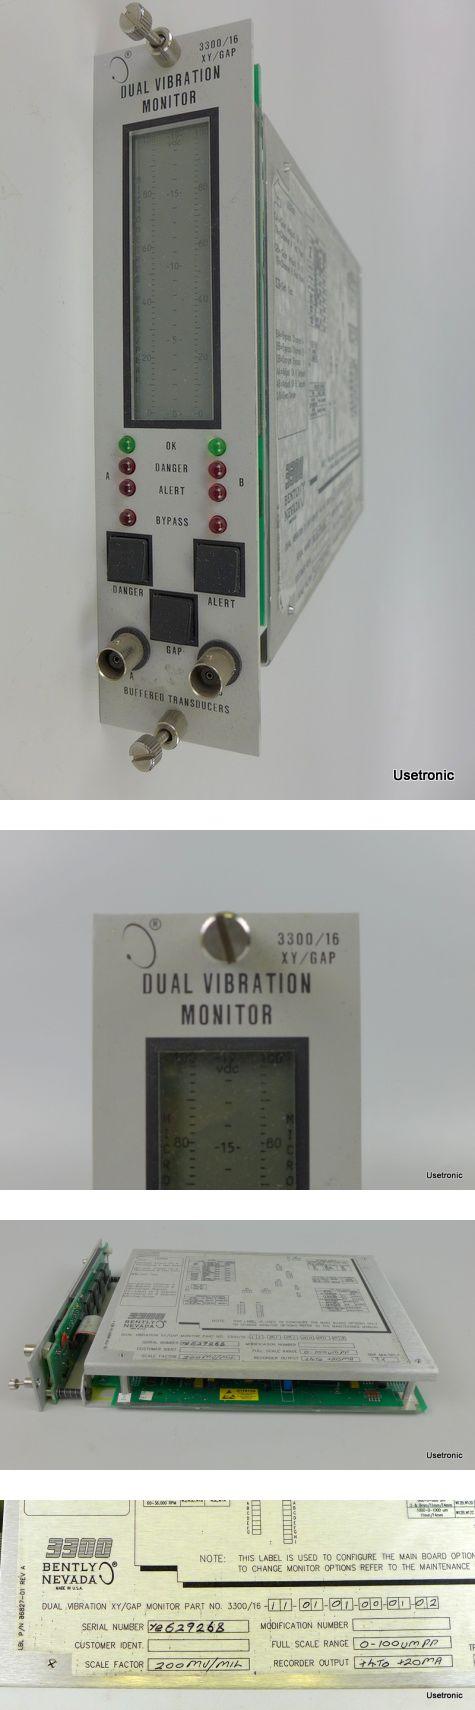 Bently Nevada Dual Vibration Monitor 3300/16 XY/GAP